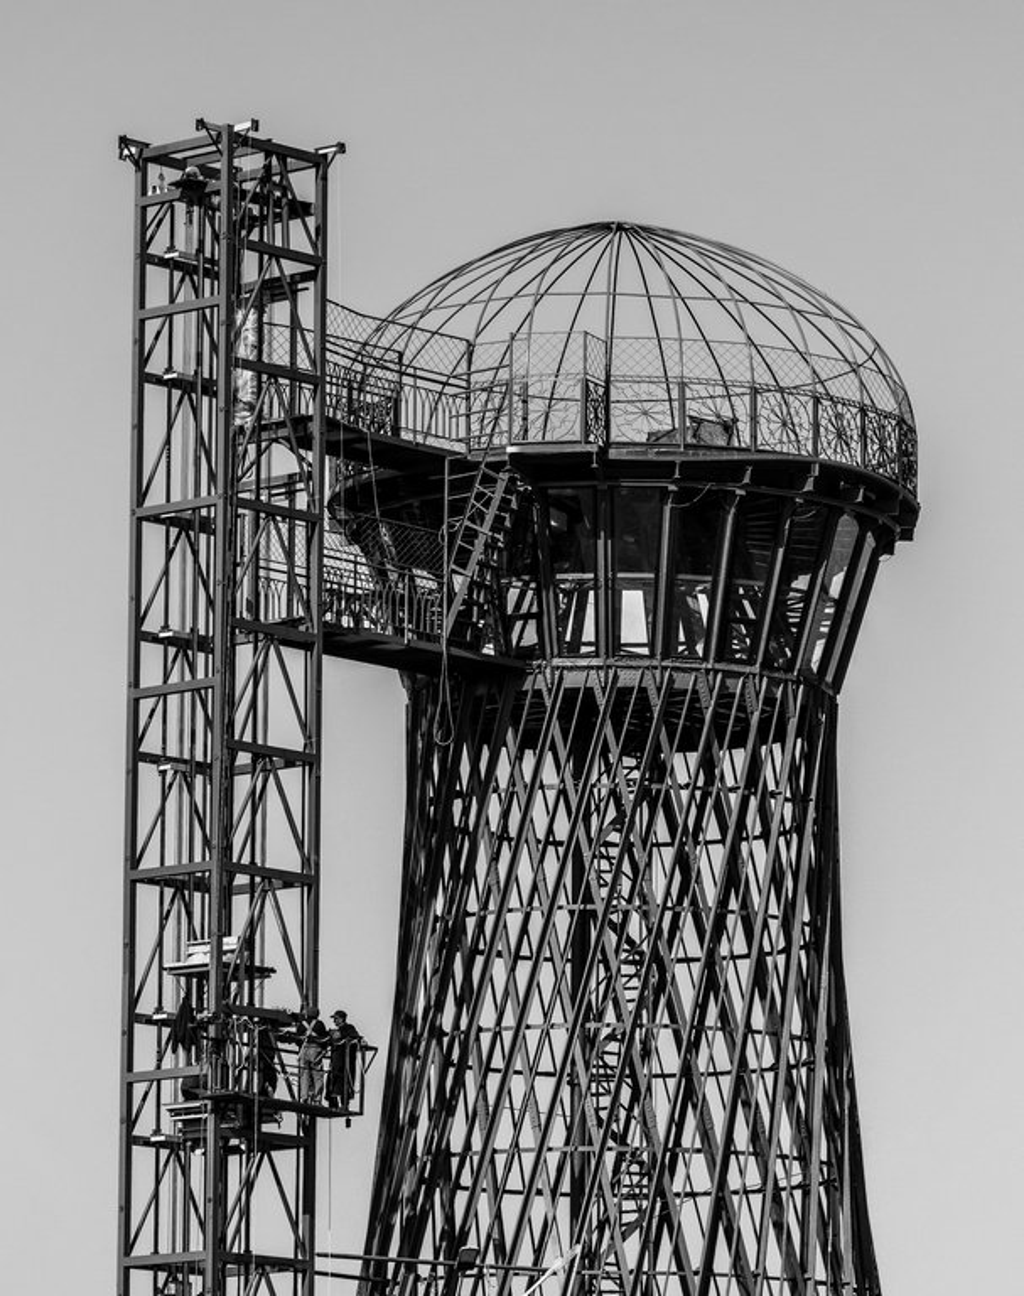 018 - Redundant Water Tower by bob65